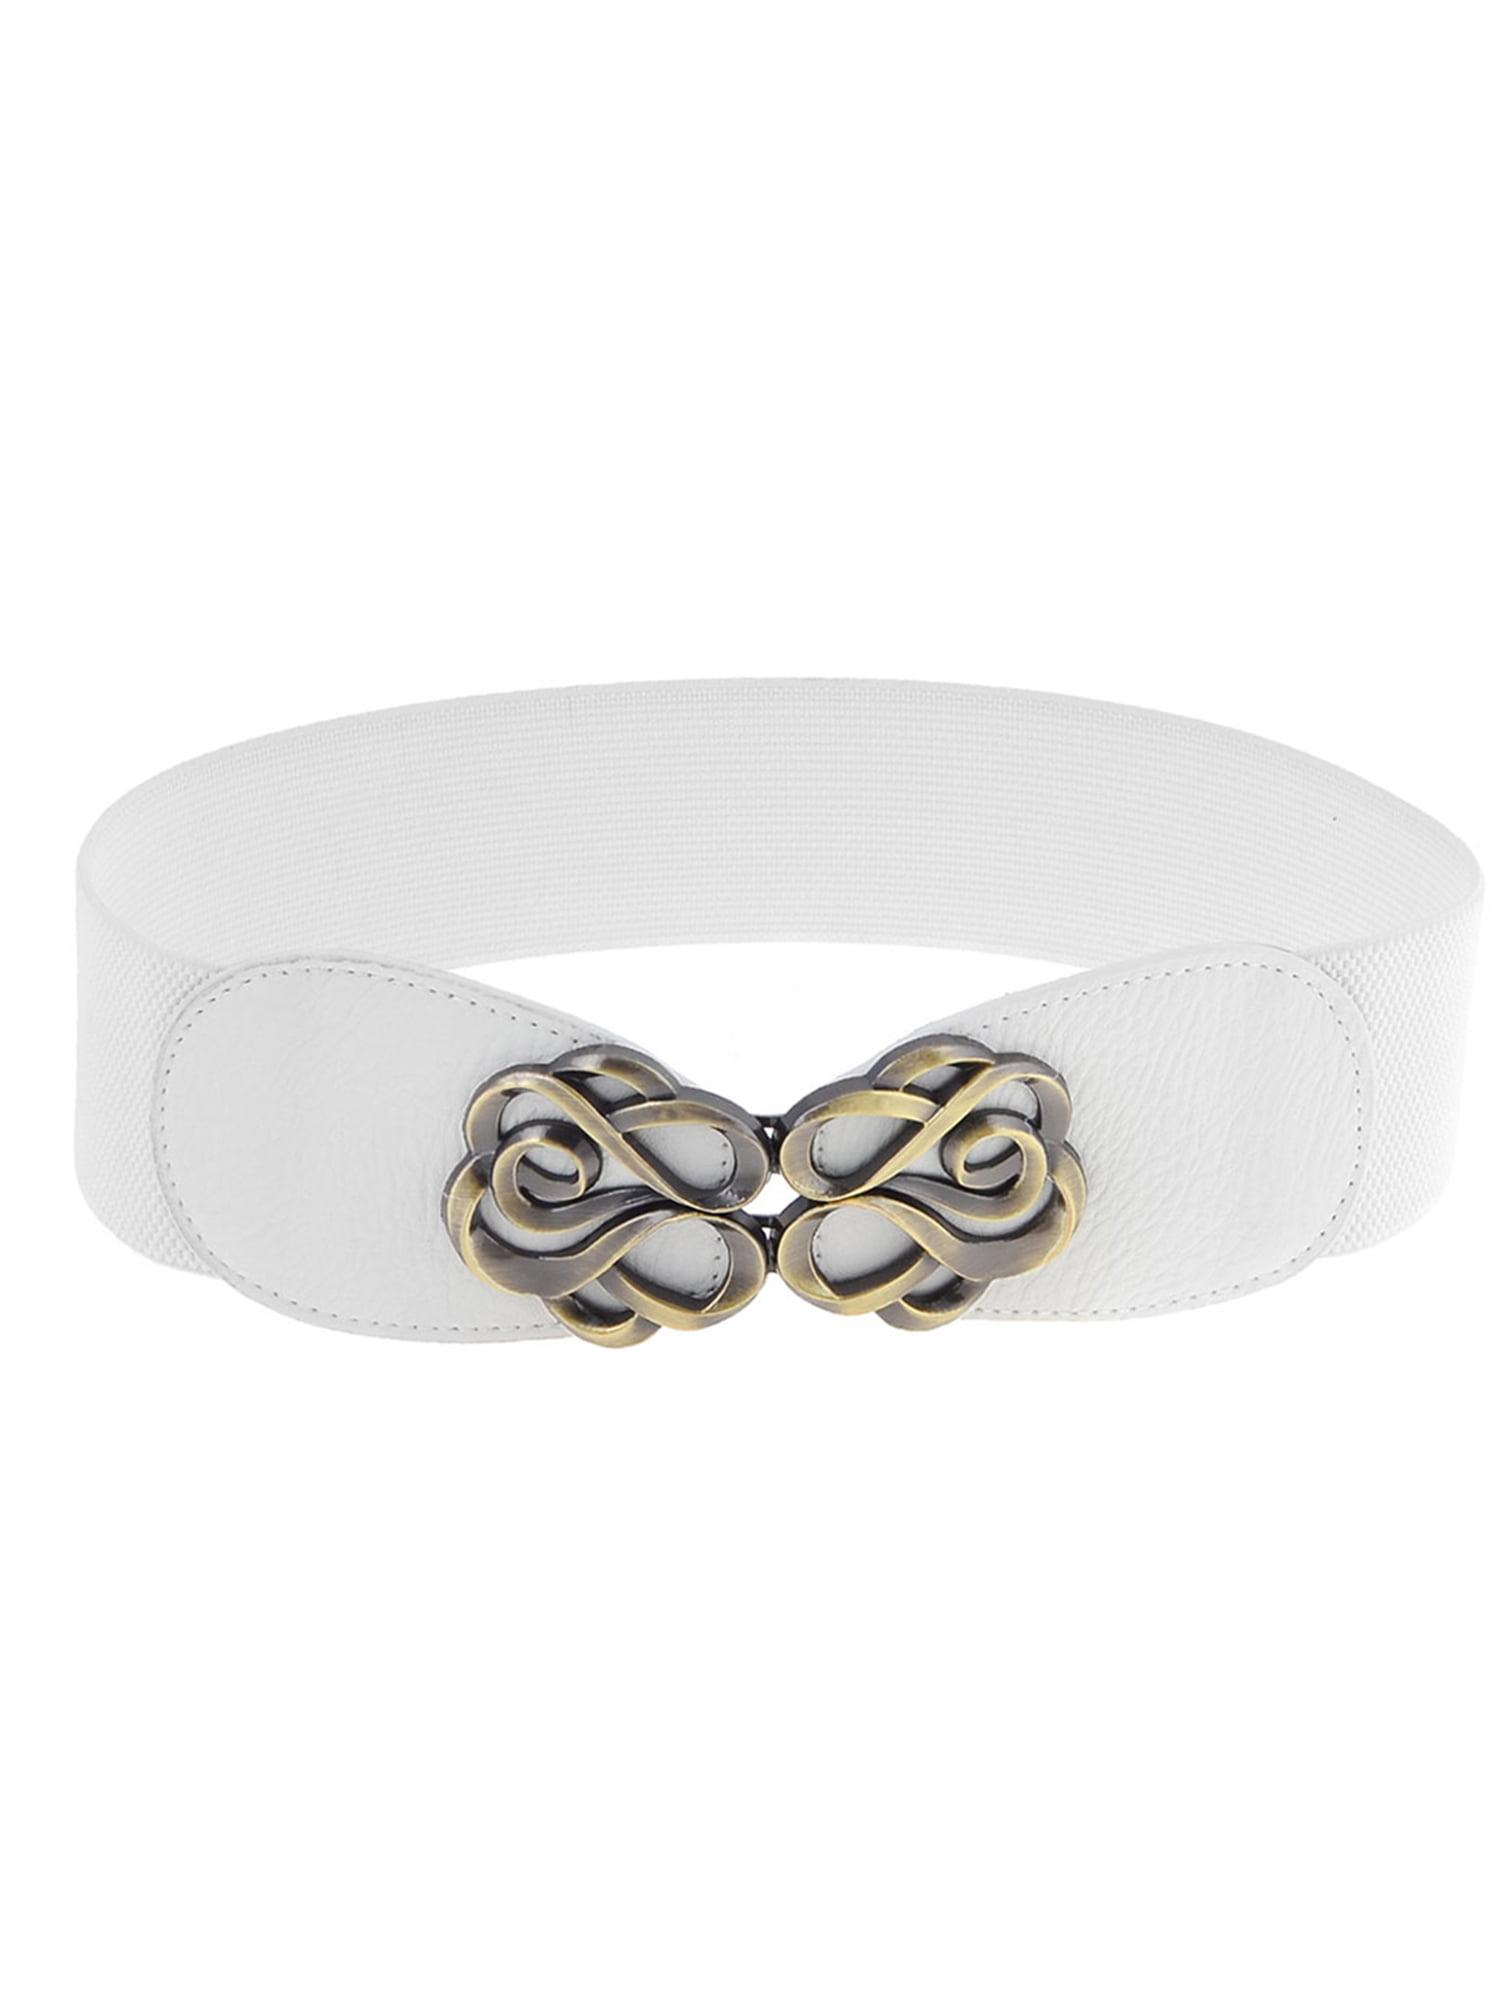 Woman Bronze Tone Flower Interlock Buckle Style Textured Elastic Cinch Belt